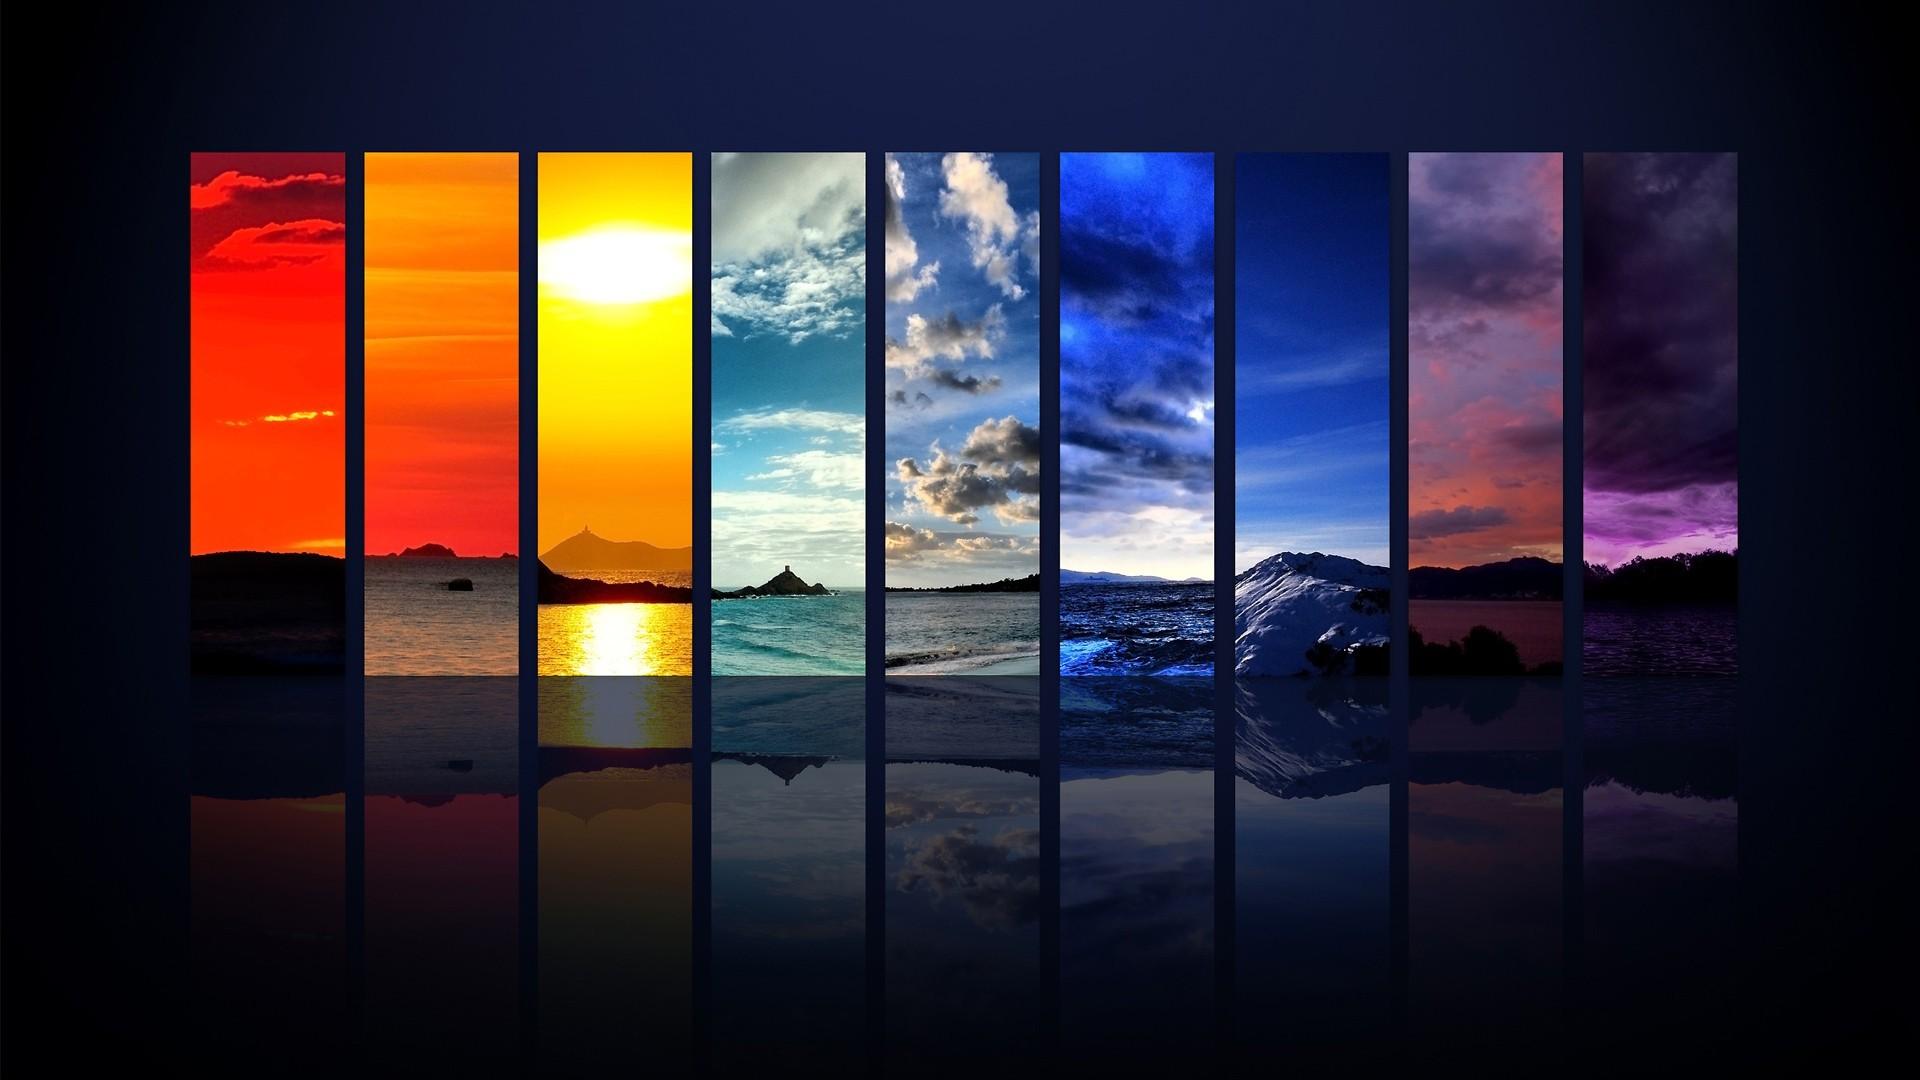 Cool Wallpapers For Desktop – Best Wallpaper HD